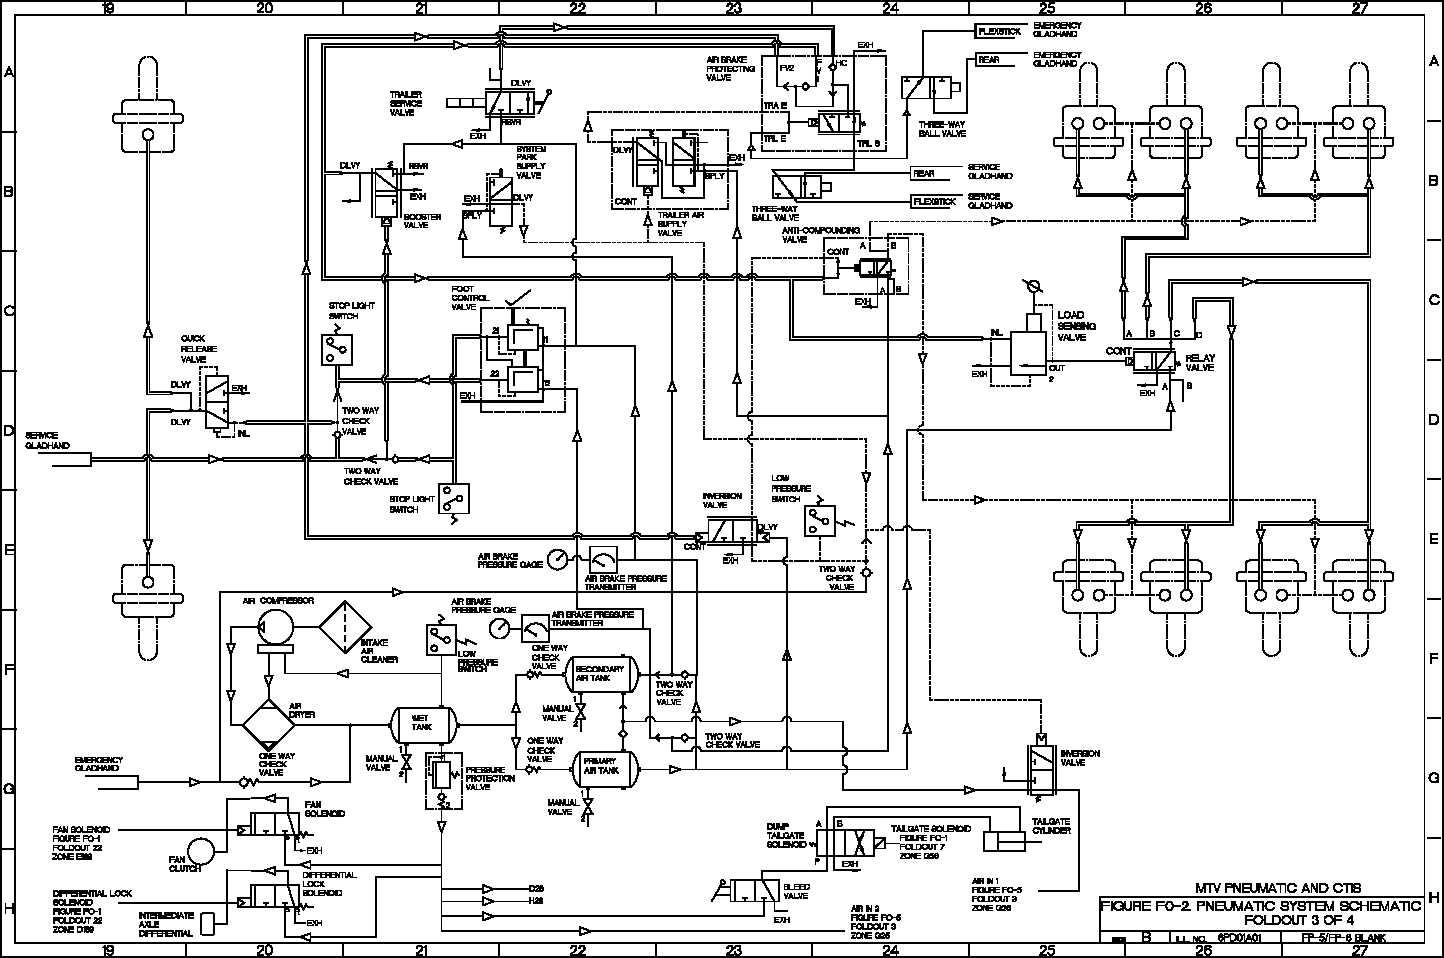 pneumatic loop wiring diagram